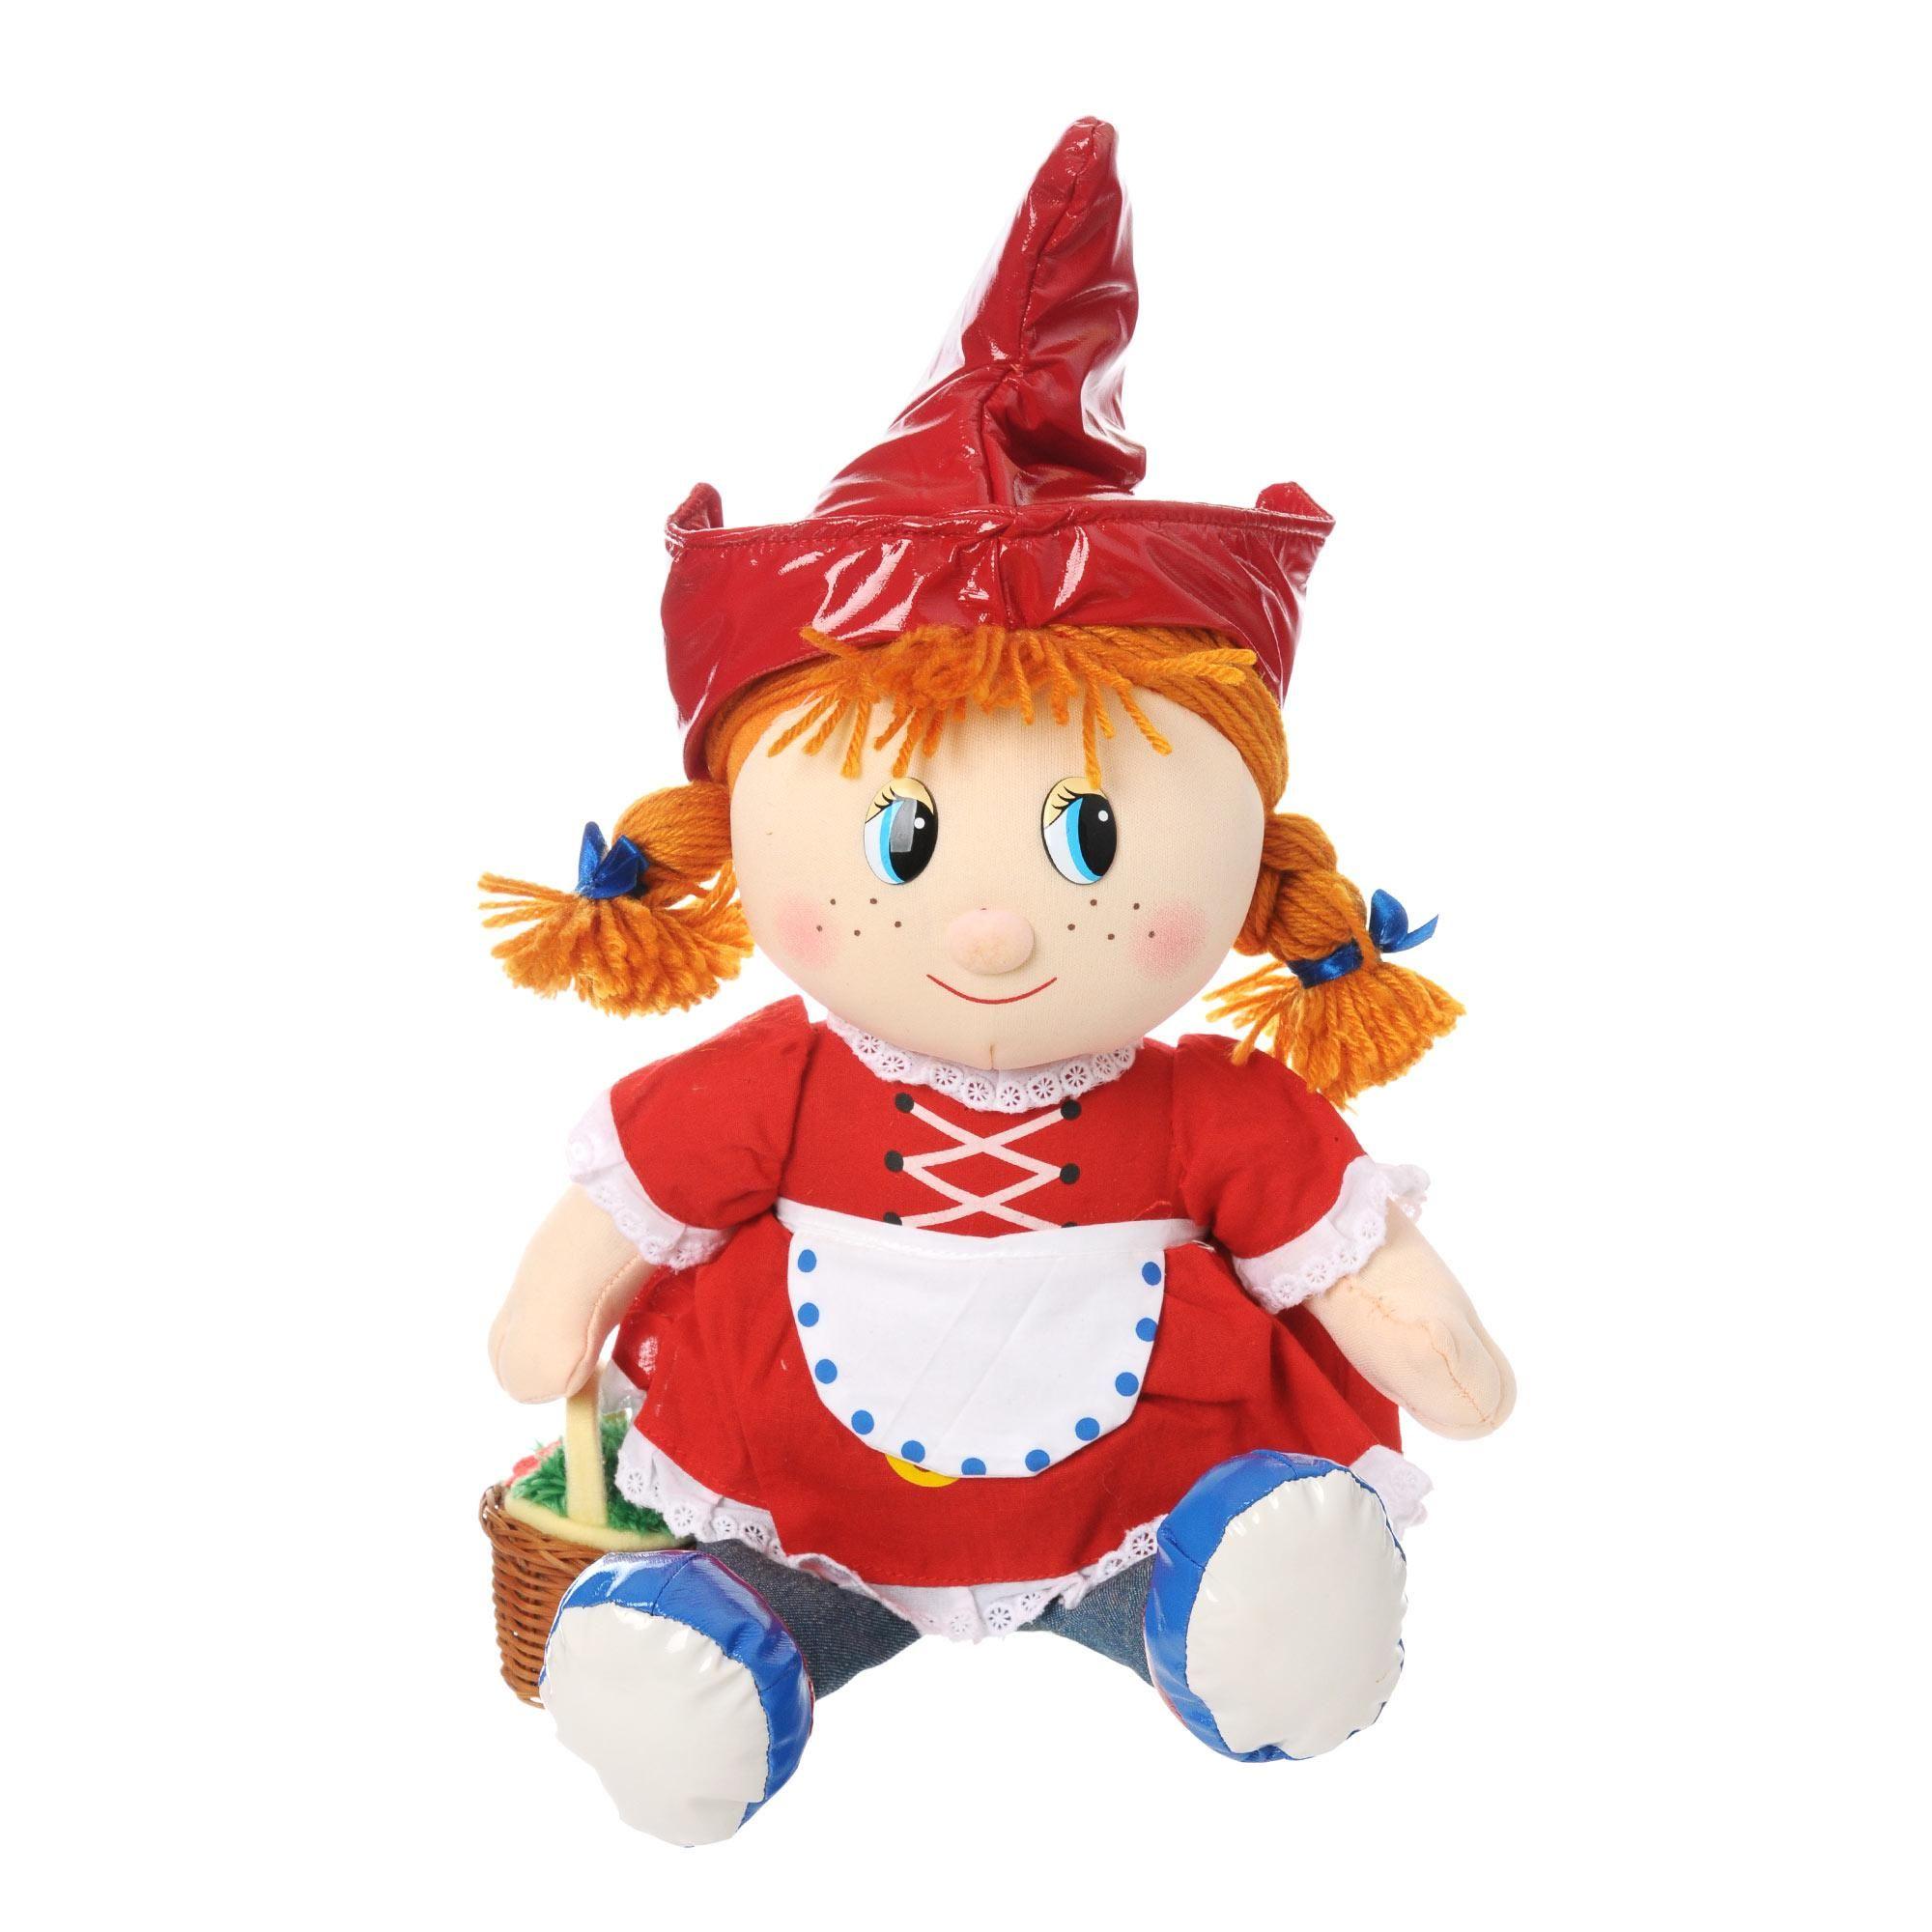 "Мягкая игрушка ""Красная шапочка"", 29 см (звук)"